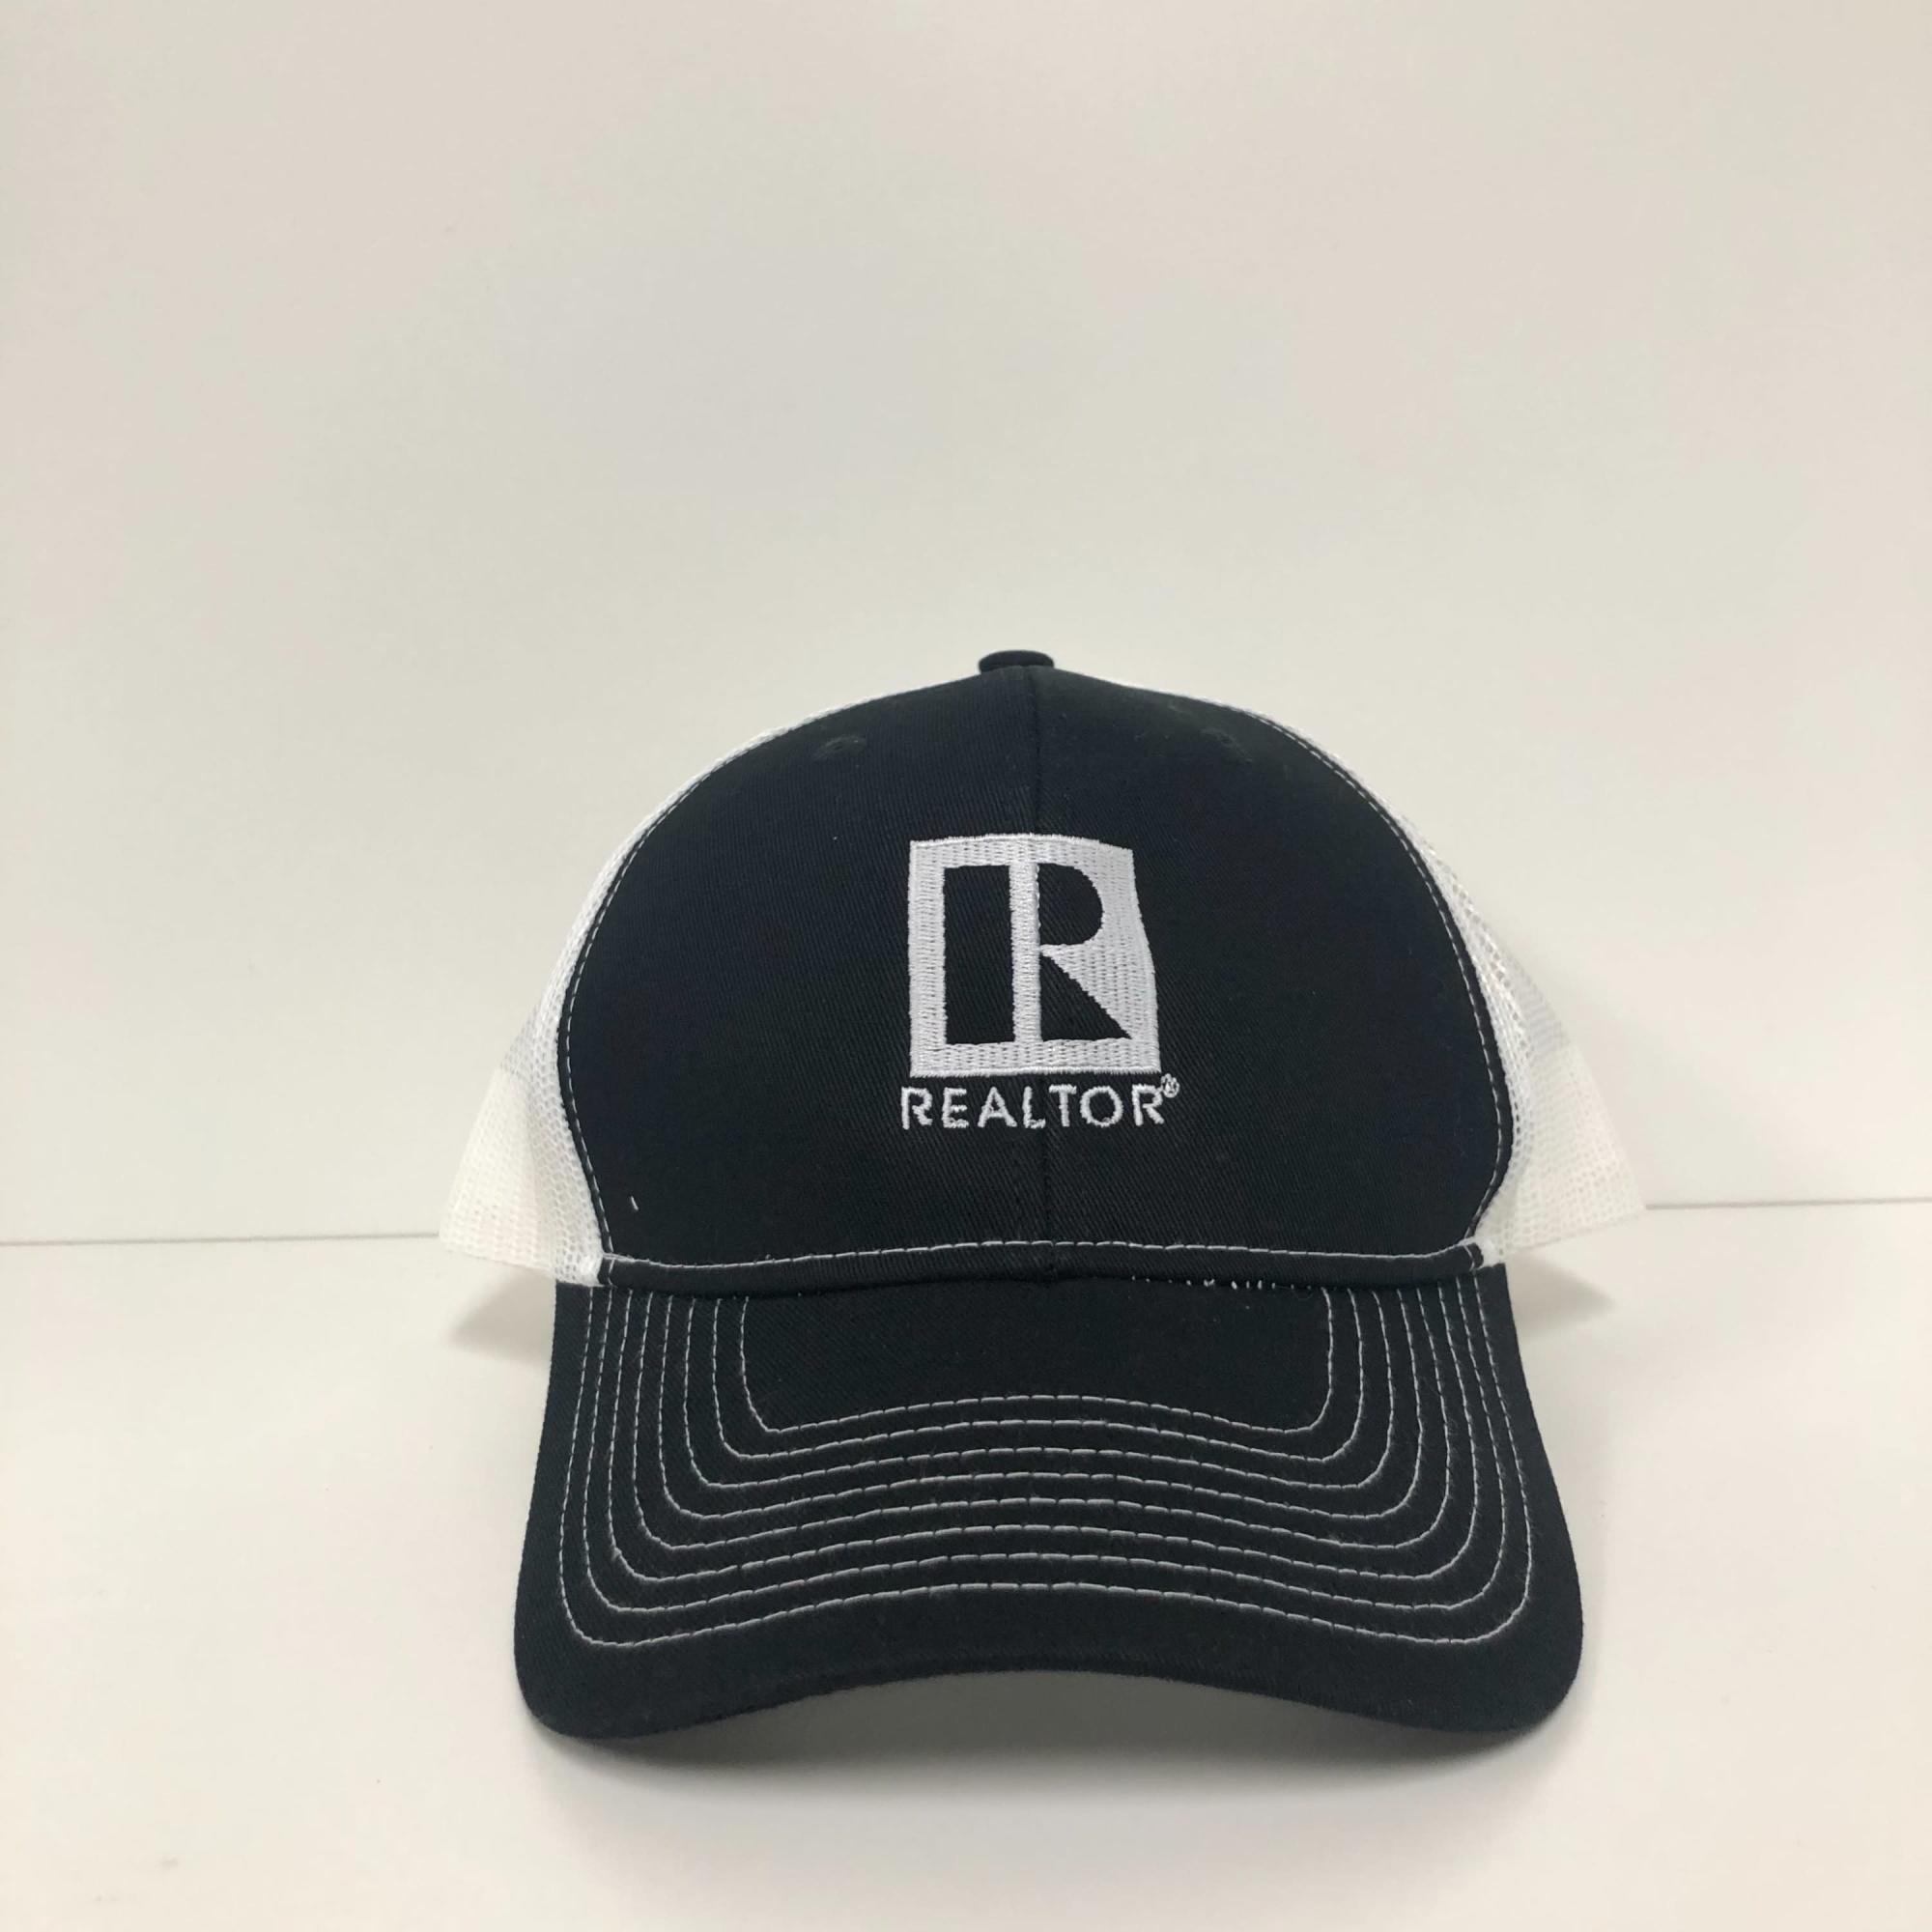 Trucker Cap, REALTOR, cap, Black and white, Realtor hat